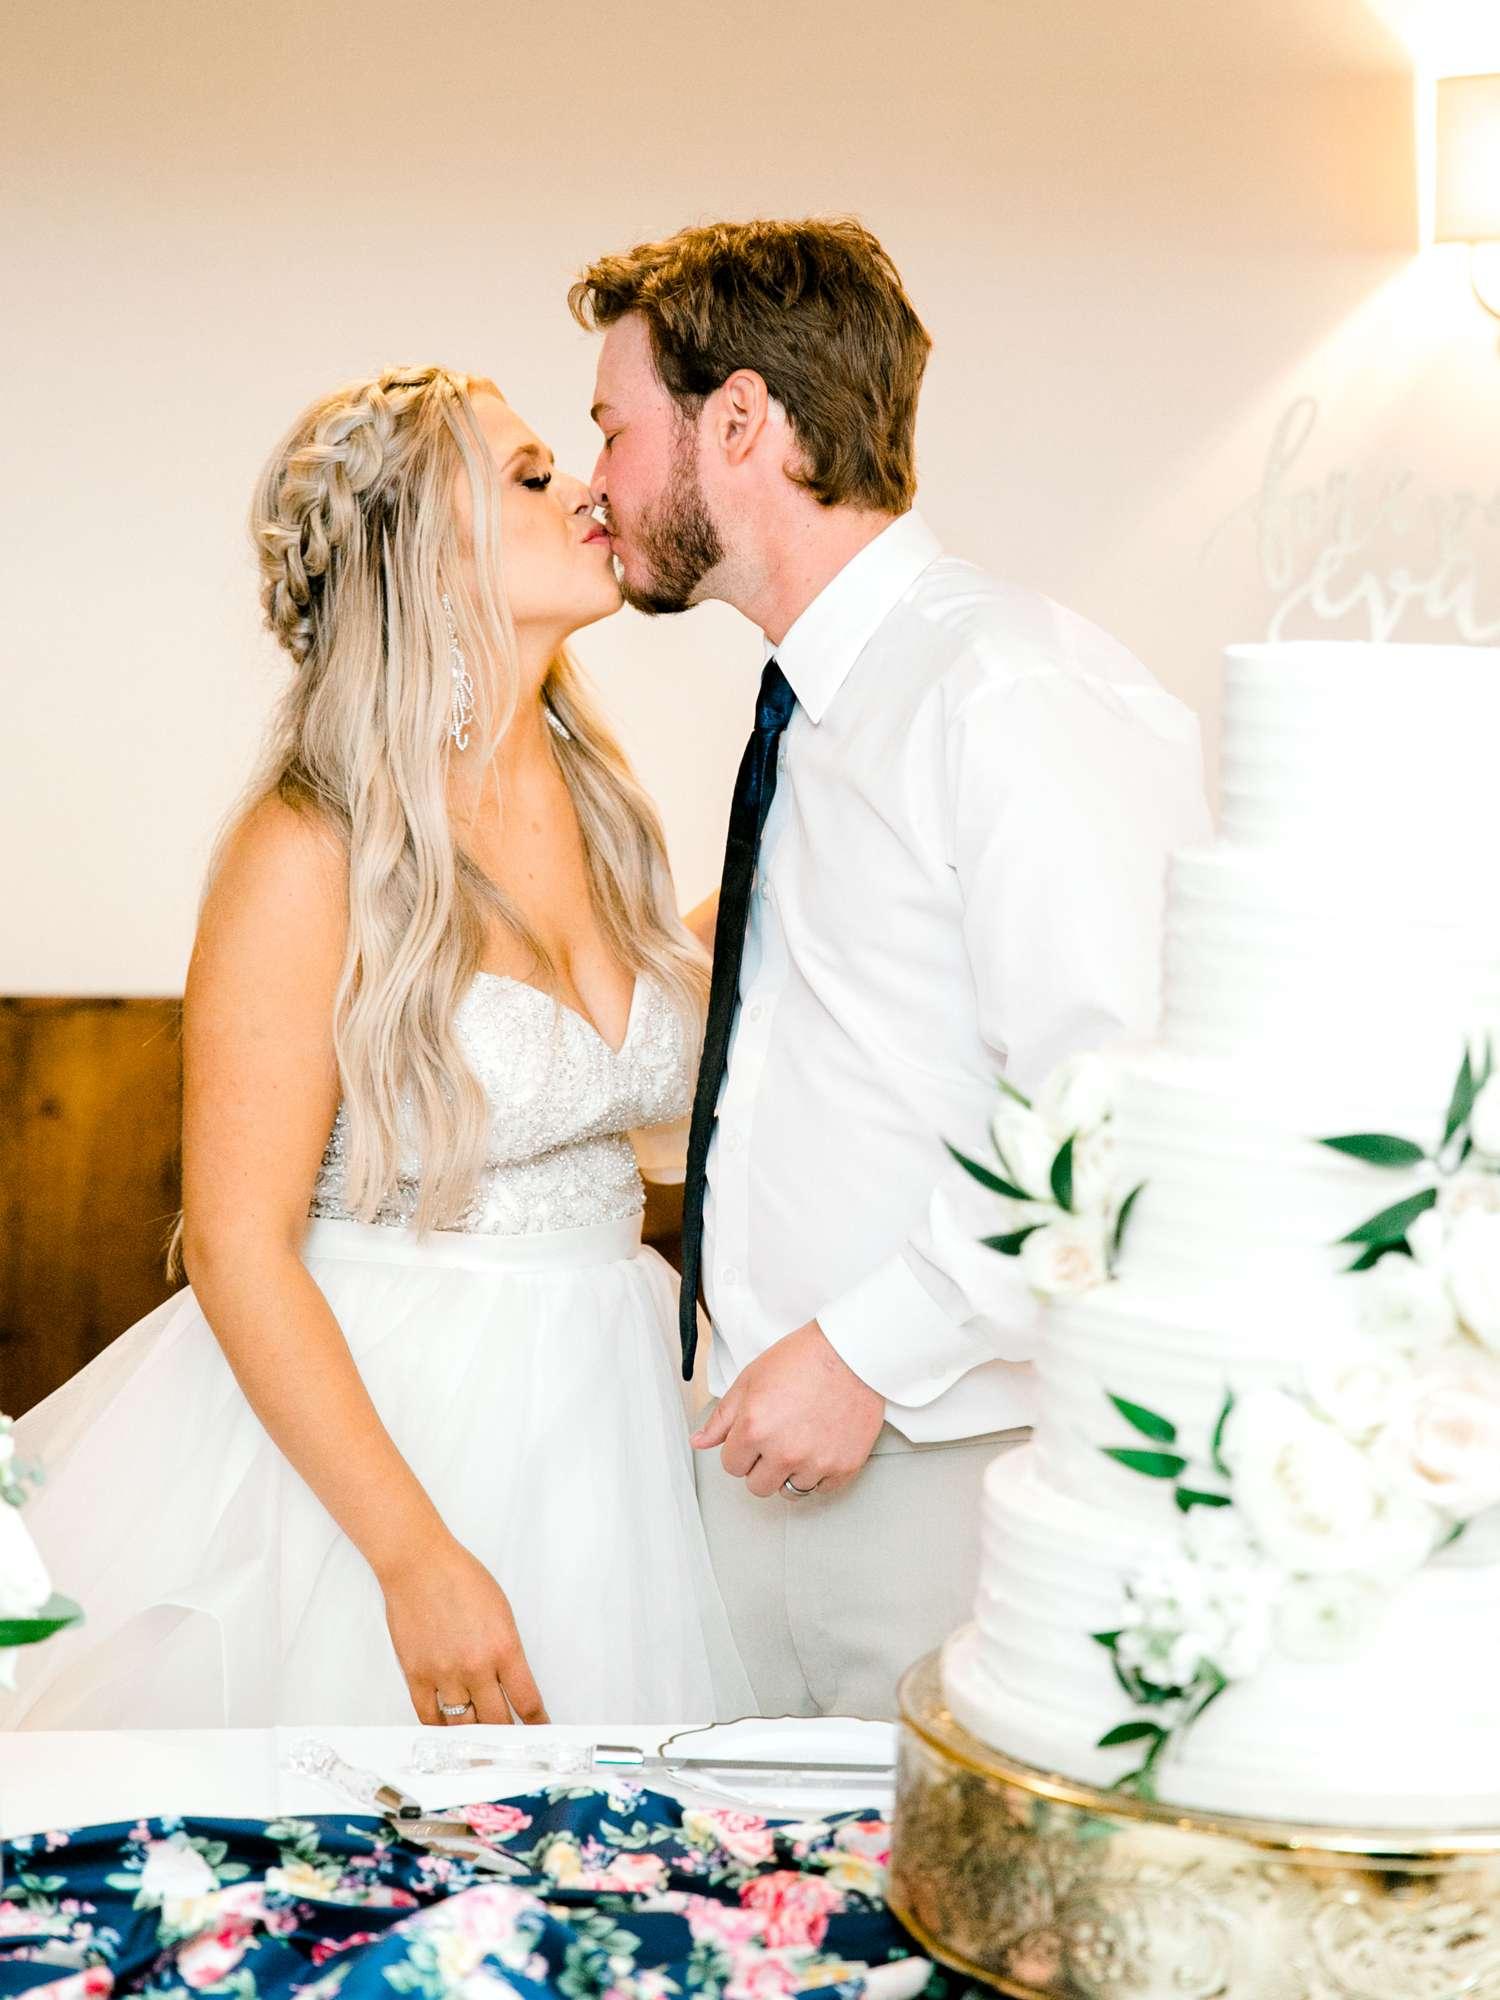 HAYLEE+JUSTIN+GREGORY+HERITAGE_HAUS_AUSTIN_TEXAS_WEDDING_0164.jpg